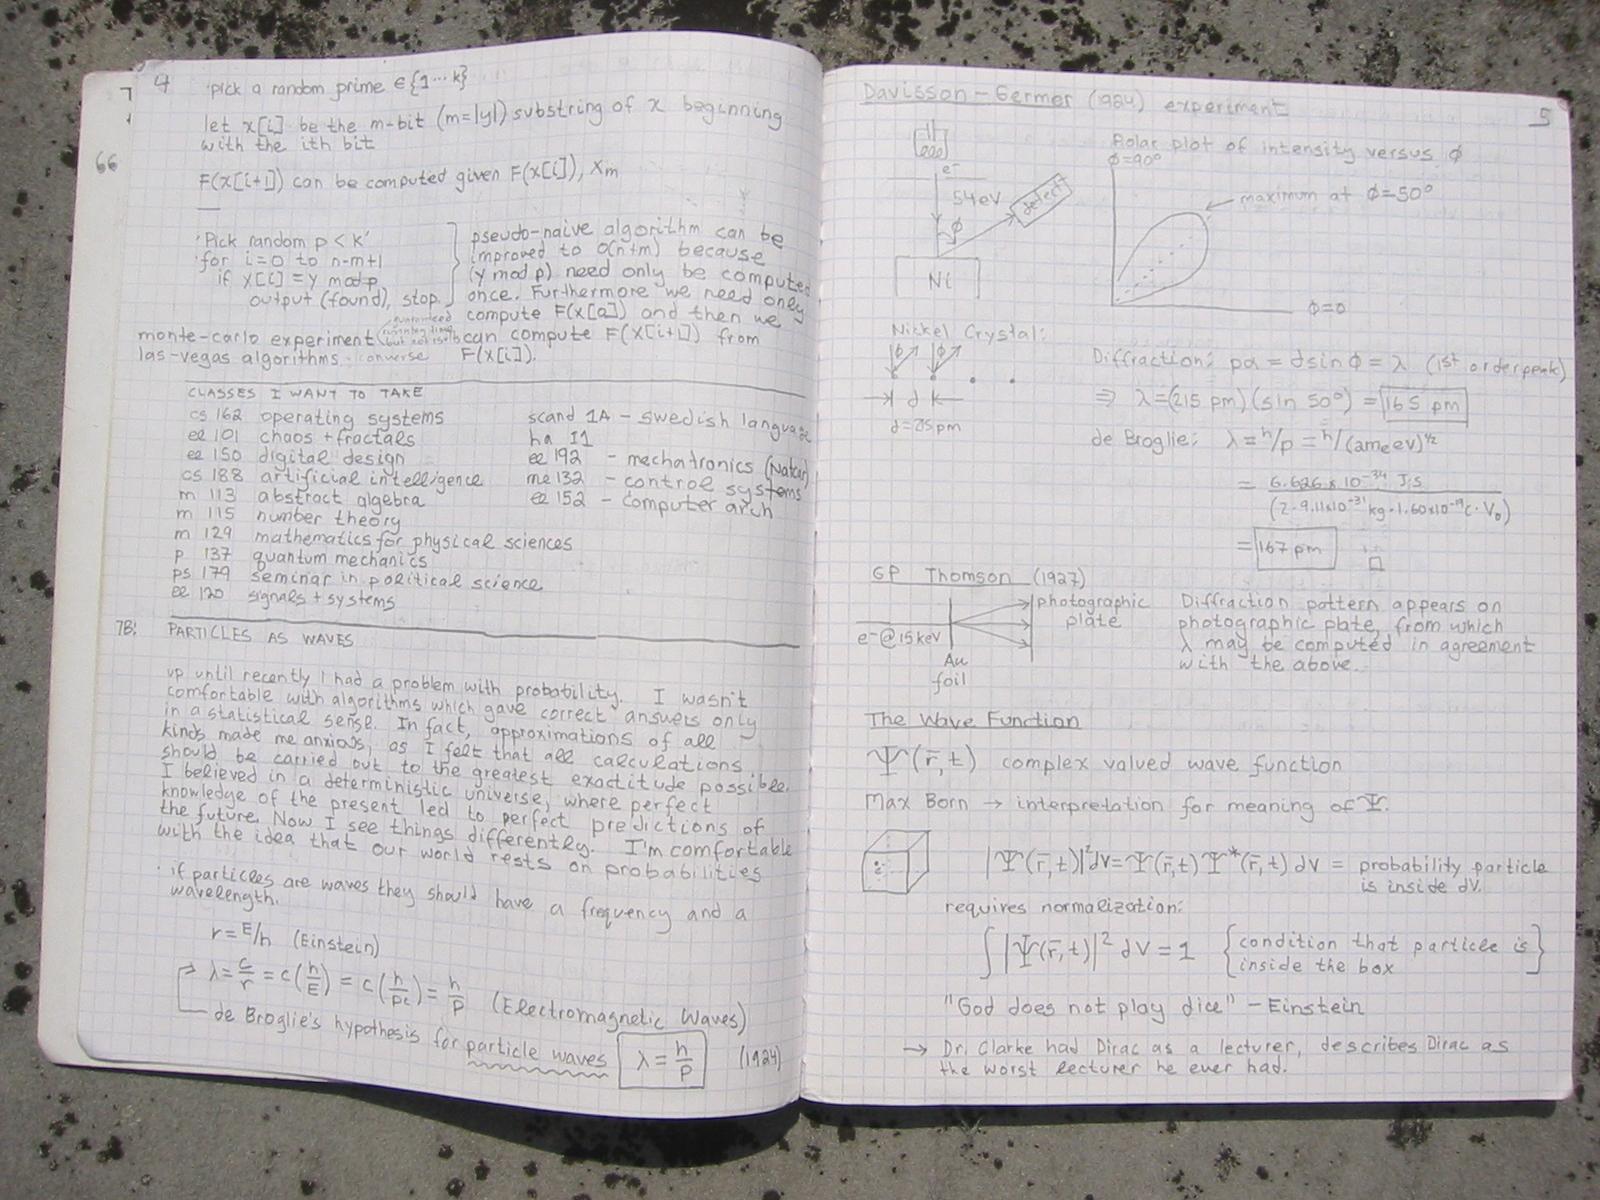 Depiction of Cuaderno